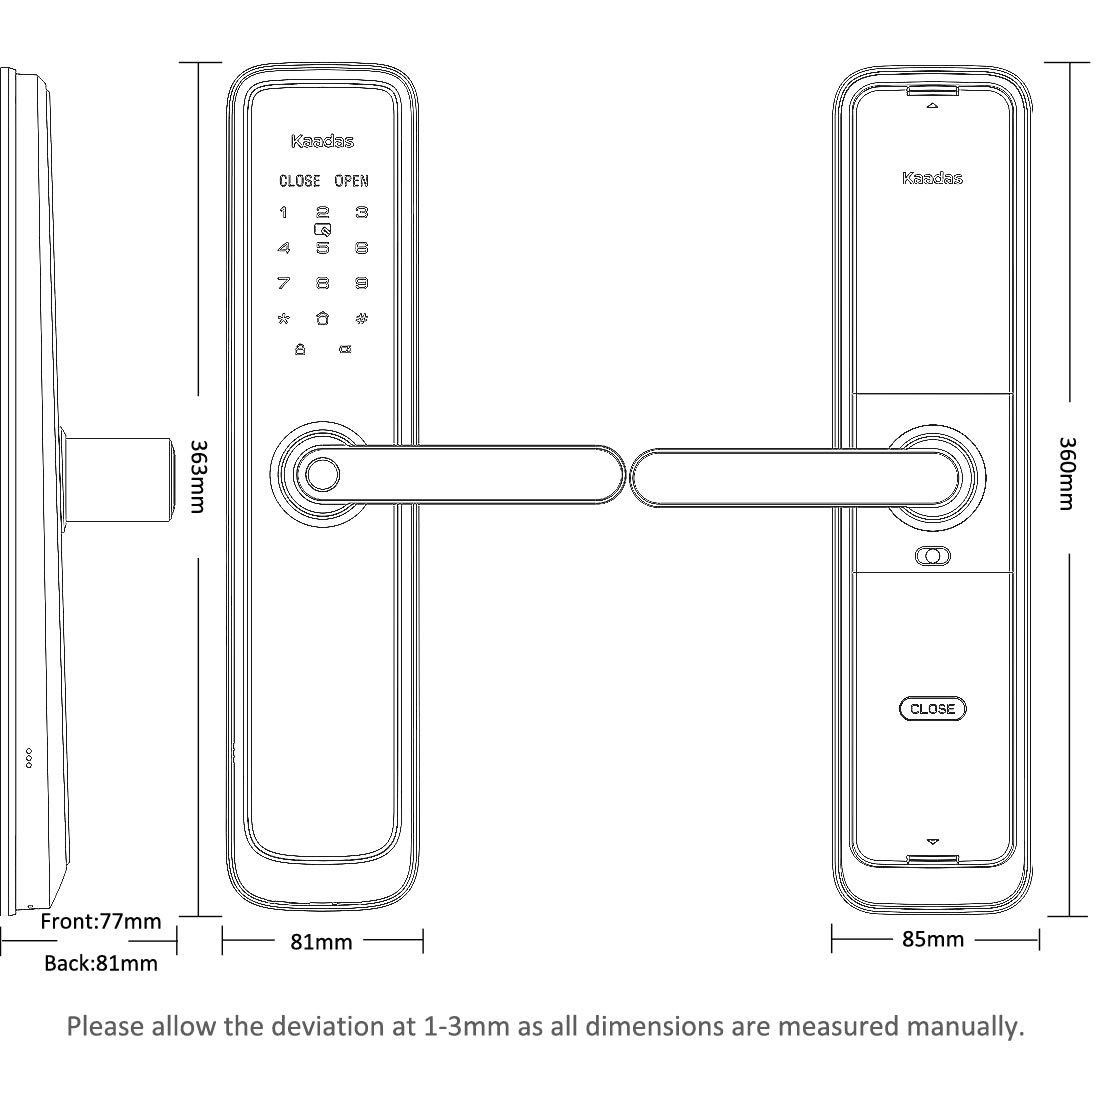 Kaadas L7-5 Lever Smart Lock,Keyless,Touch Pad,Fingerprint+Password+RFID Card+Key(Obsidian Black)